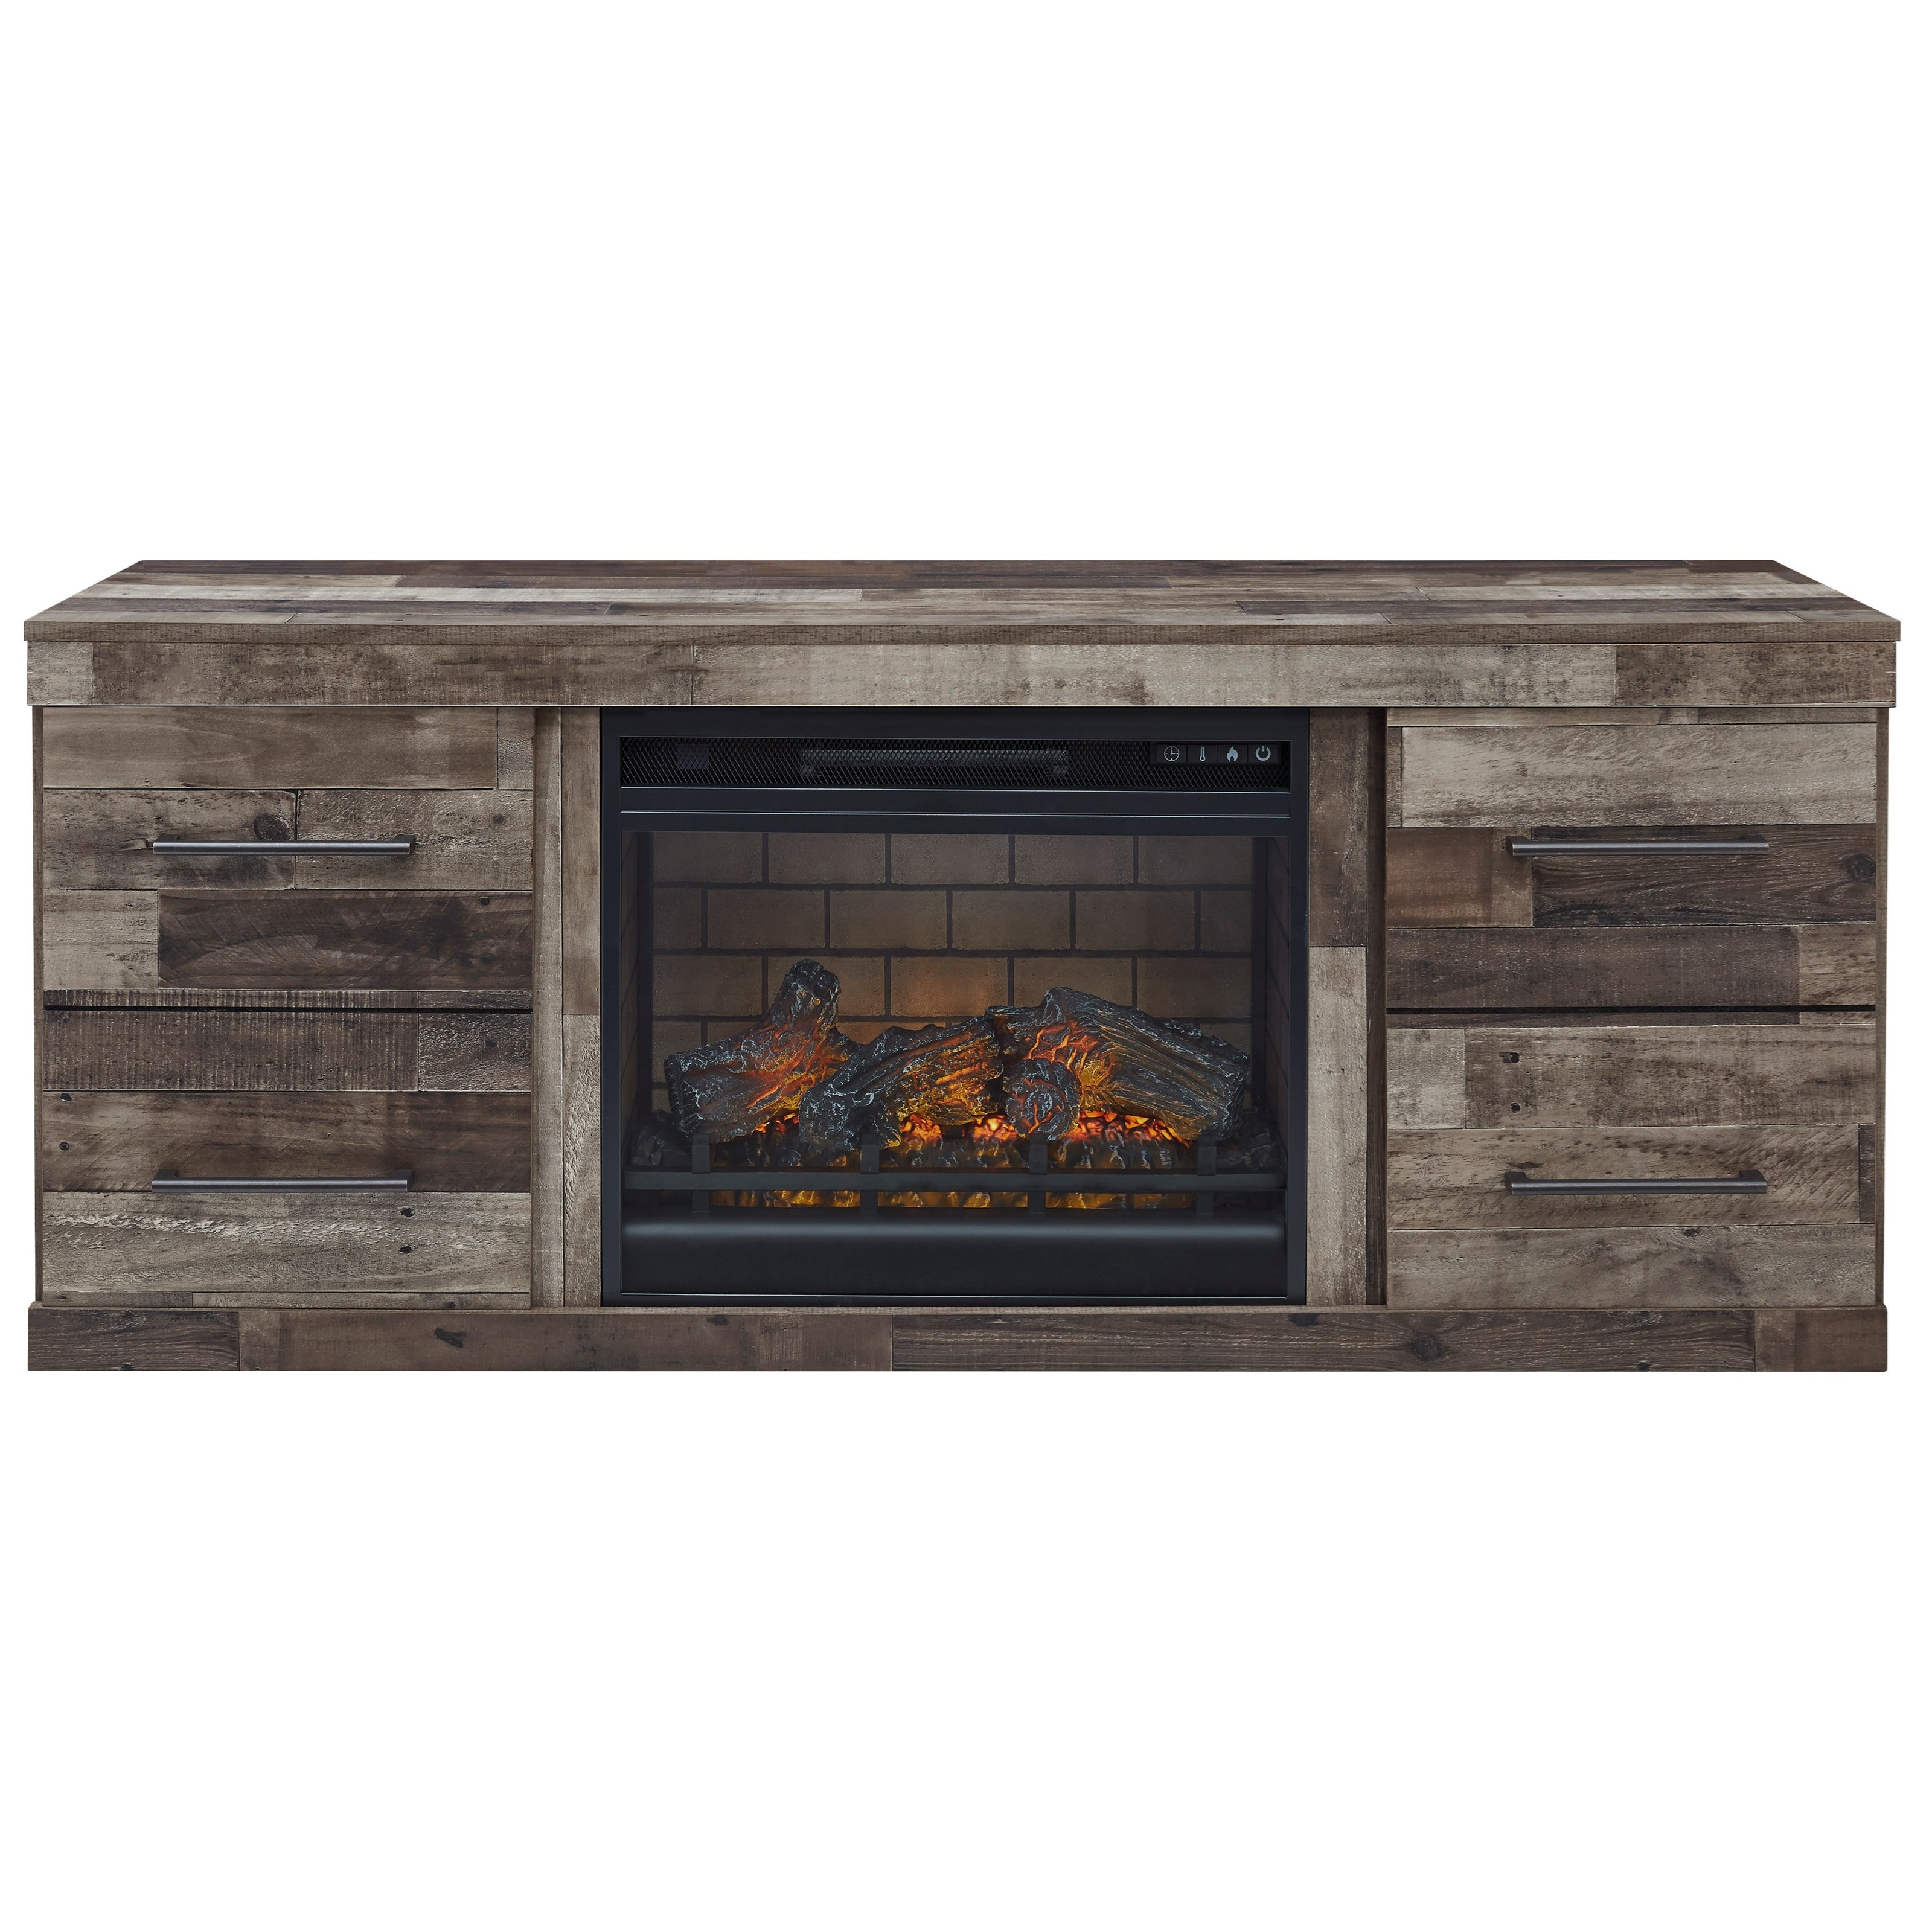 Derekson Fireplace Console by Ashley (Signature Design) at Johnny Janosik